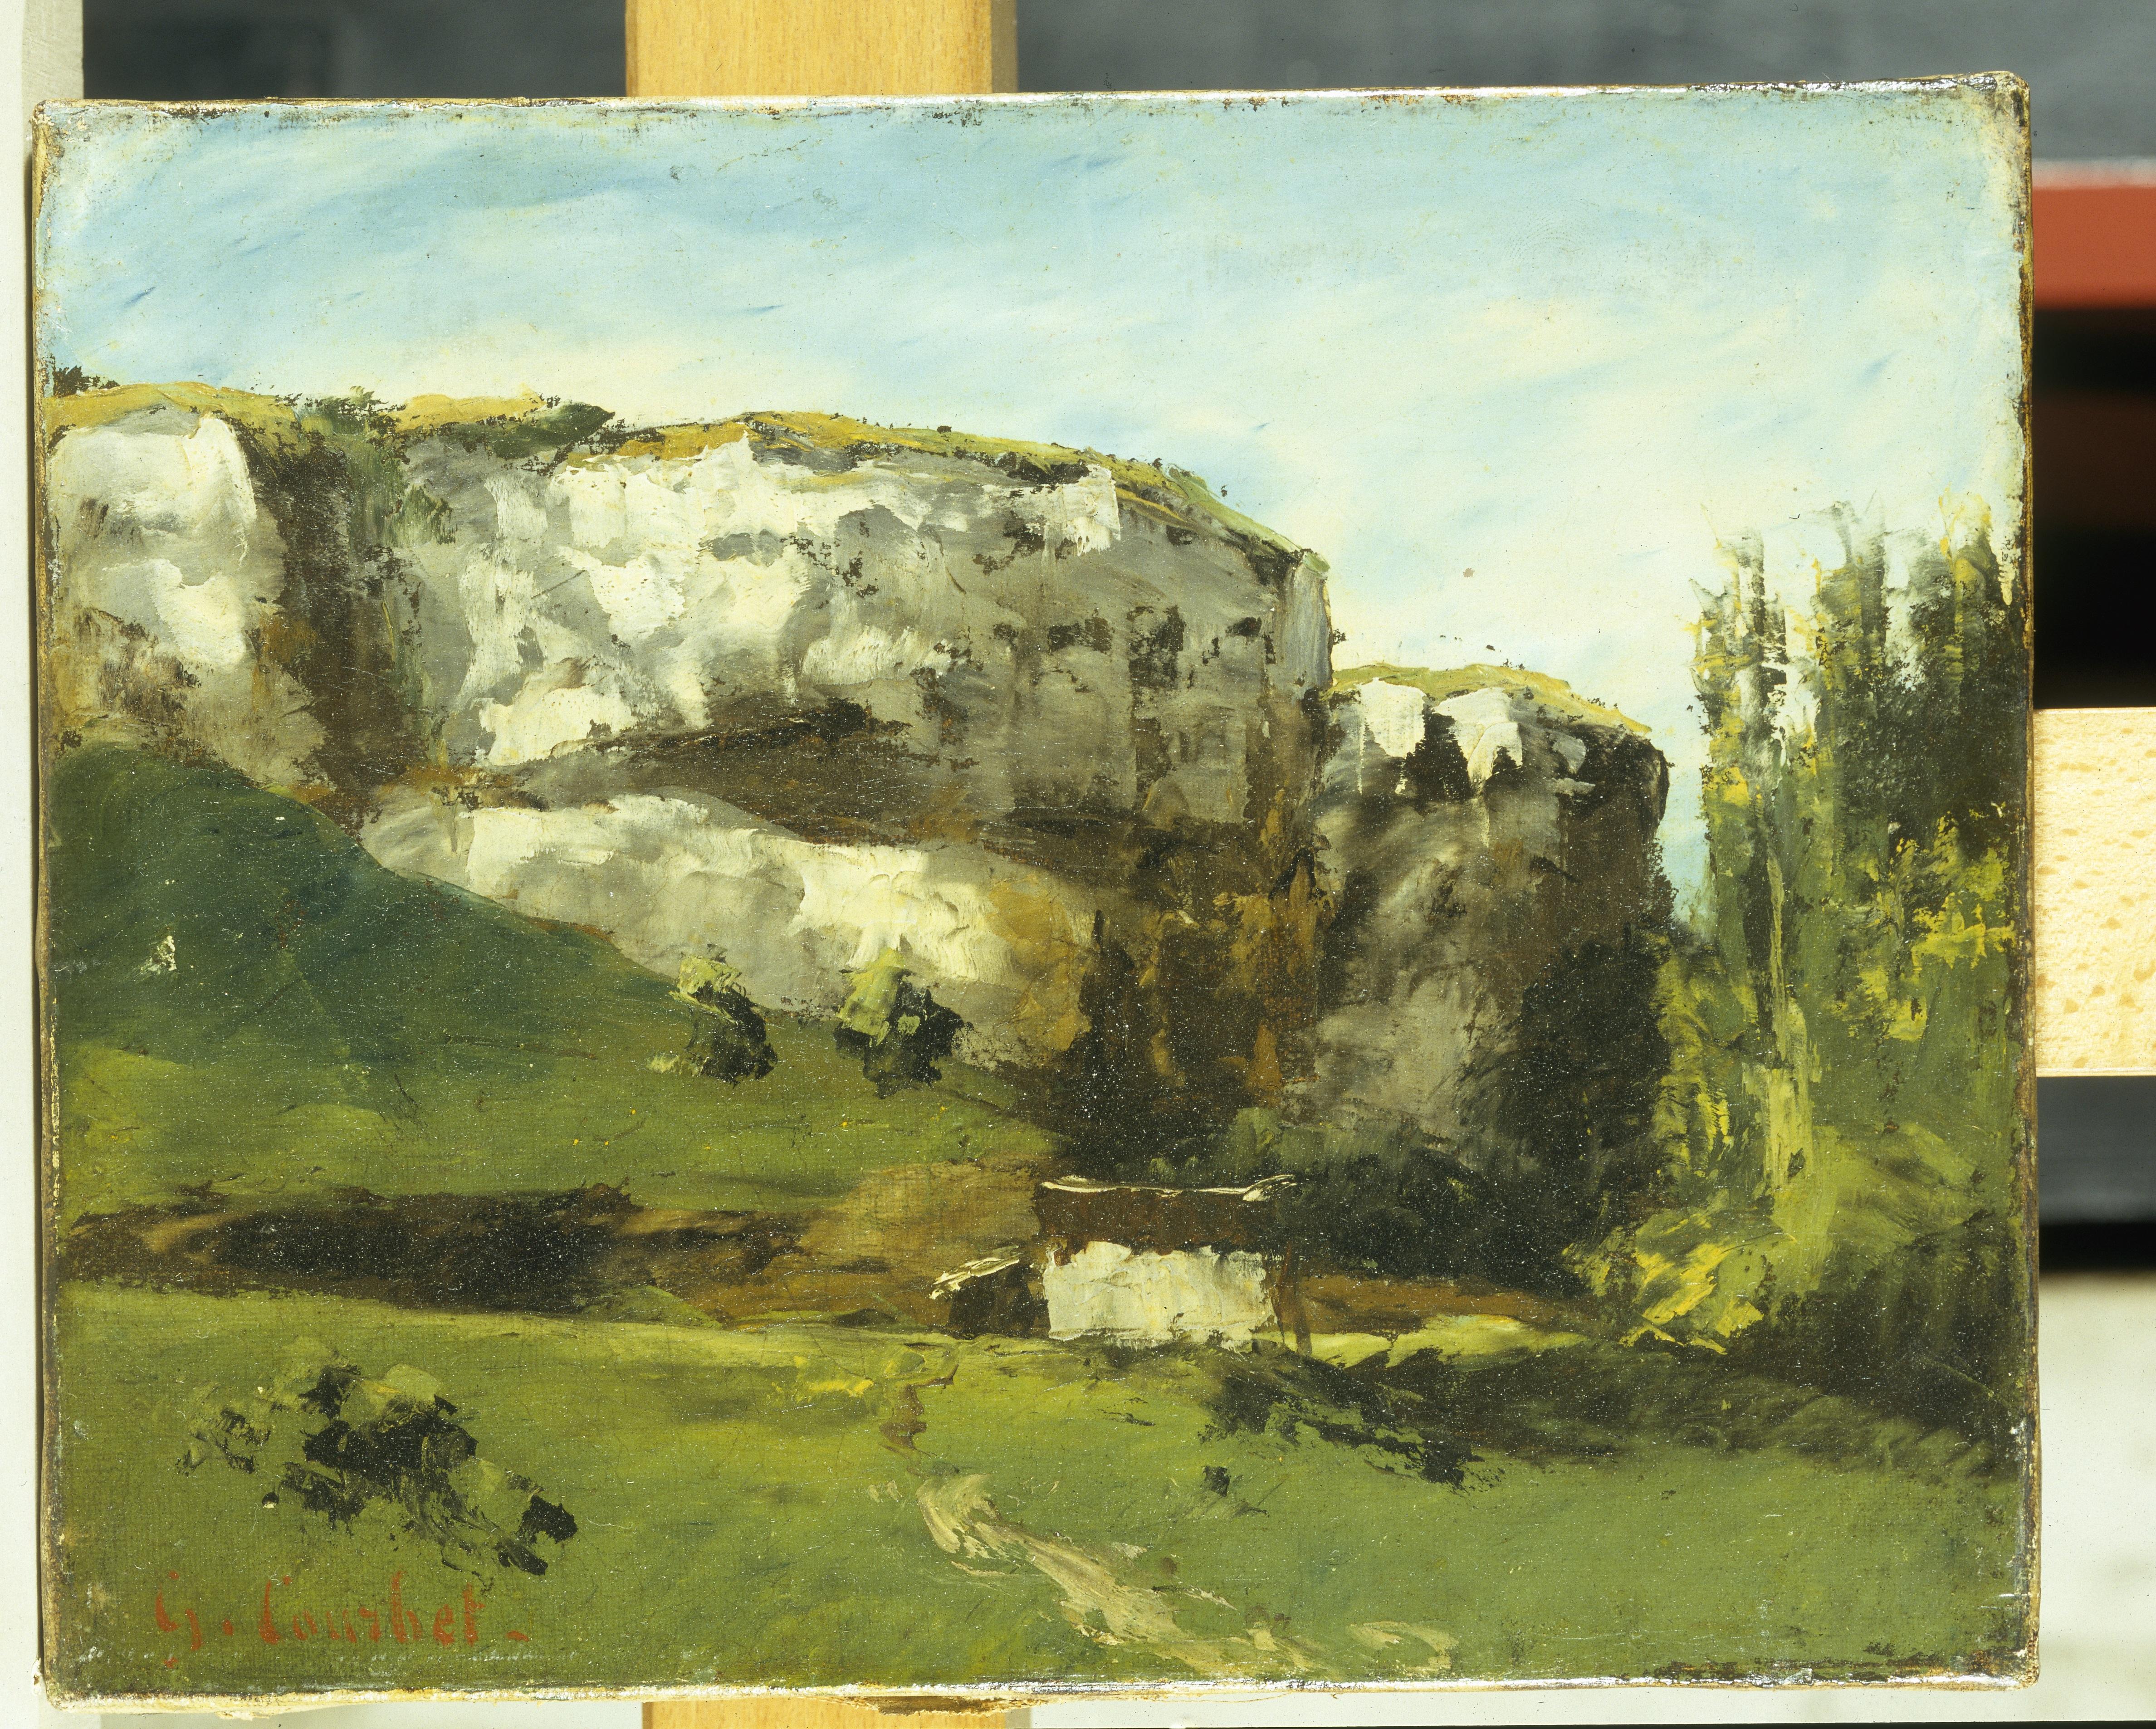 mnr/MNR01000/MNR1000-copyright-Musee_des_beaux-Arts_et_d_archeologie_photo_Charles_Choffet-inv-D-996-2-1-face.jpg